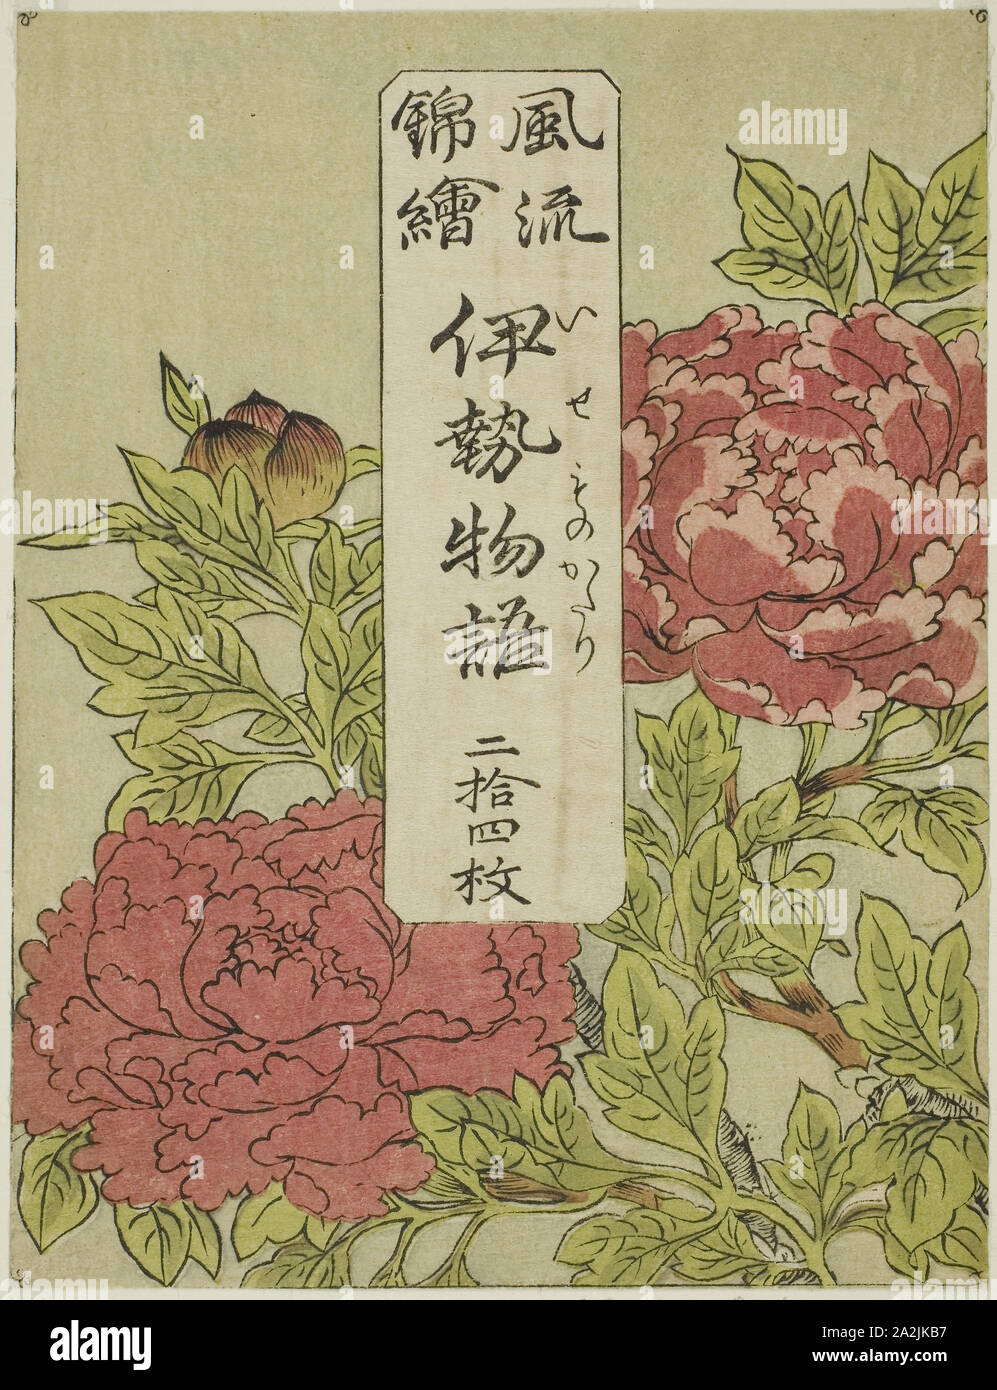 Color-Printed Wrapper for the series Furyu Nishiki-e Ise Monogatori, c. 1772/73, Katsukawa Shunsho 勝川 春章, Japanese, 1726-1792, Japan, Color woodblock print, Overall: 63.5 x 40.8 cm (25 x 16 1/16 in.), Image: 17.5 x 13.5 cm (6 7/8 x 5 5/16 in Stock Photo